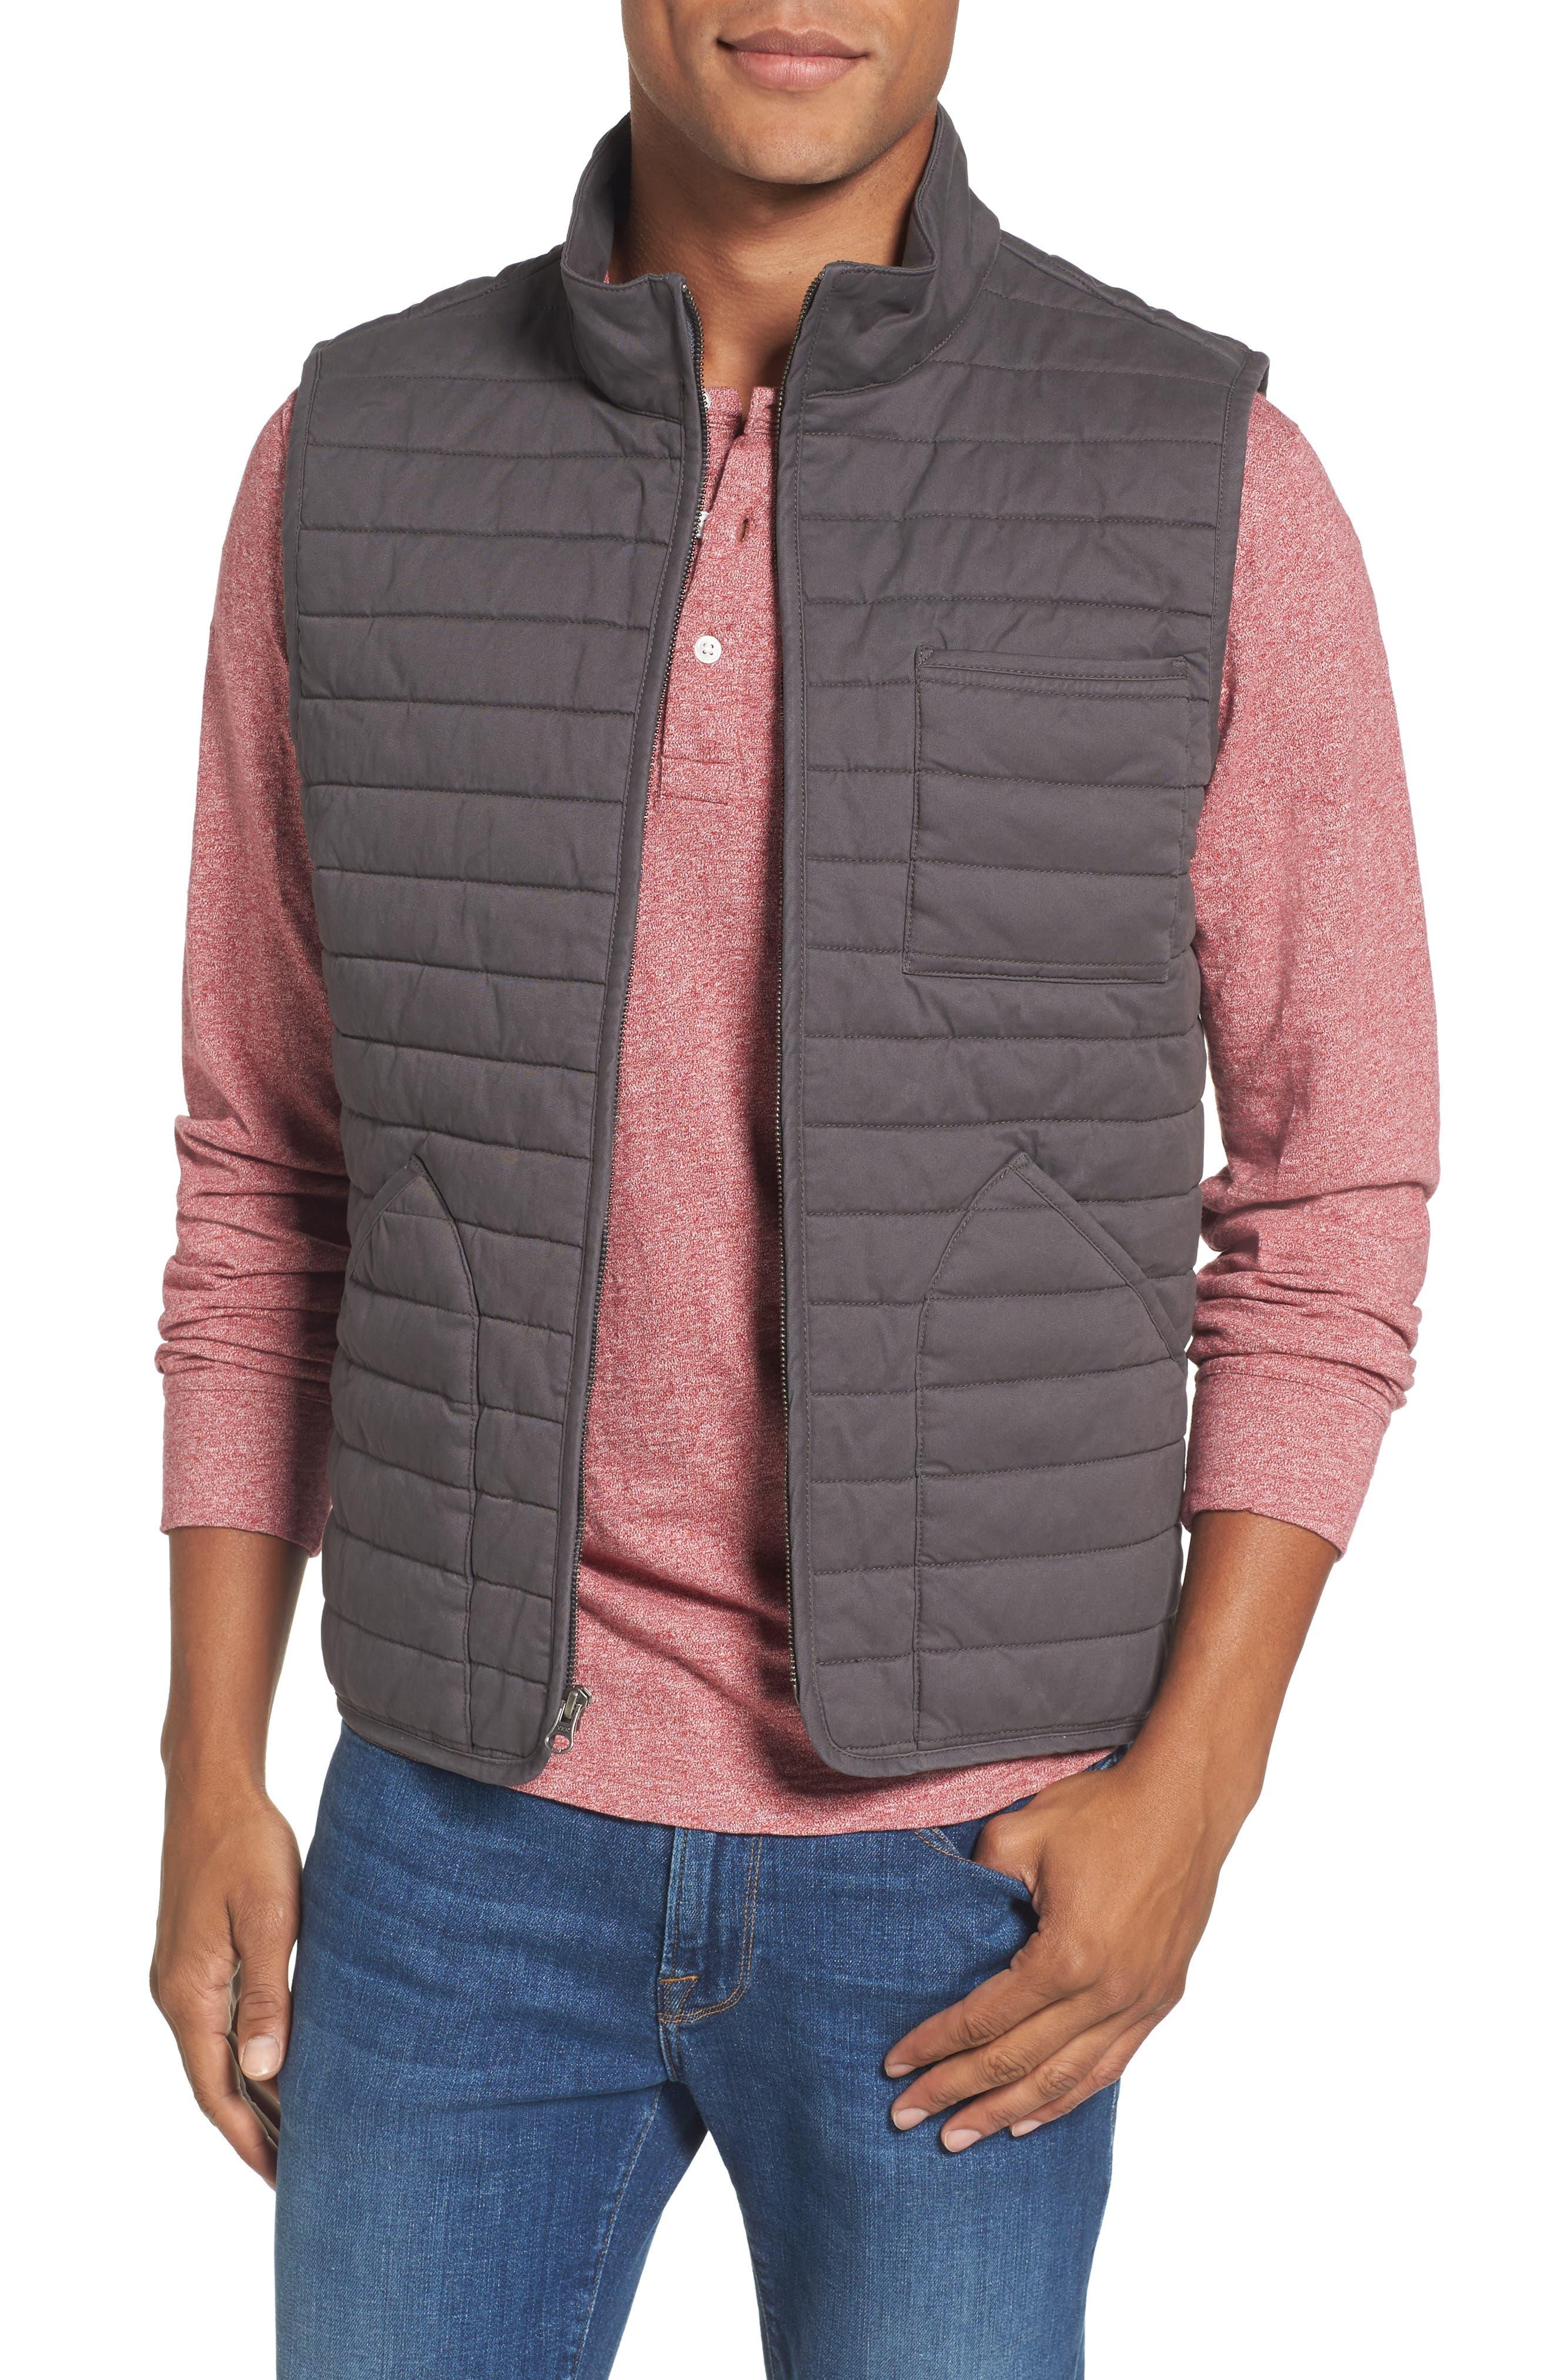 Alternate Image 1 Selected - Nordstrom Men's Shop Quilted Twill Vest (Regular & Tall)